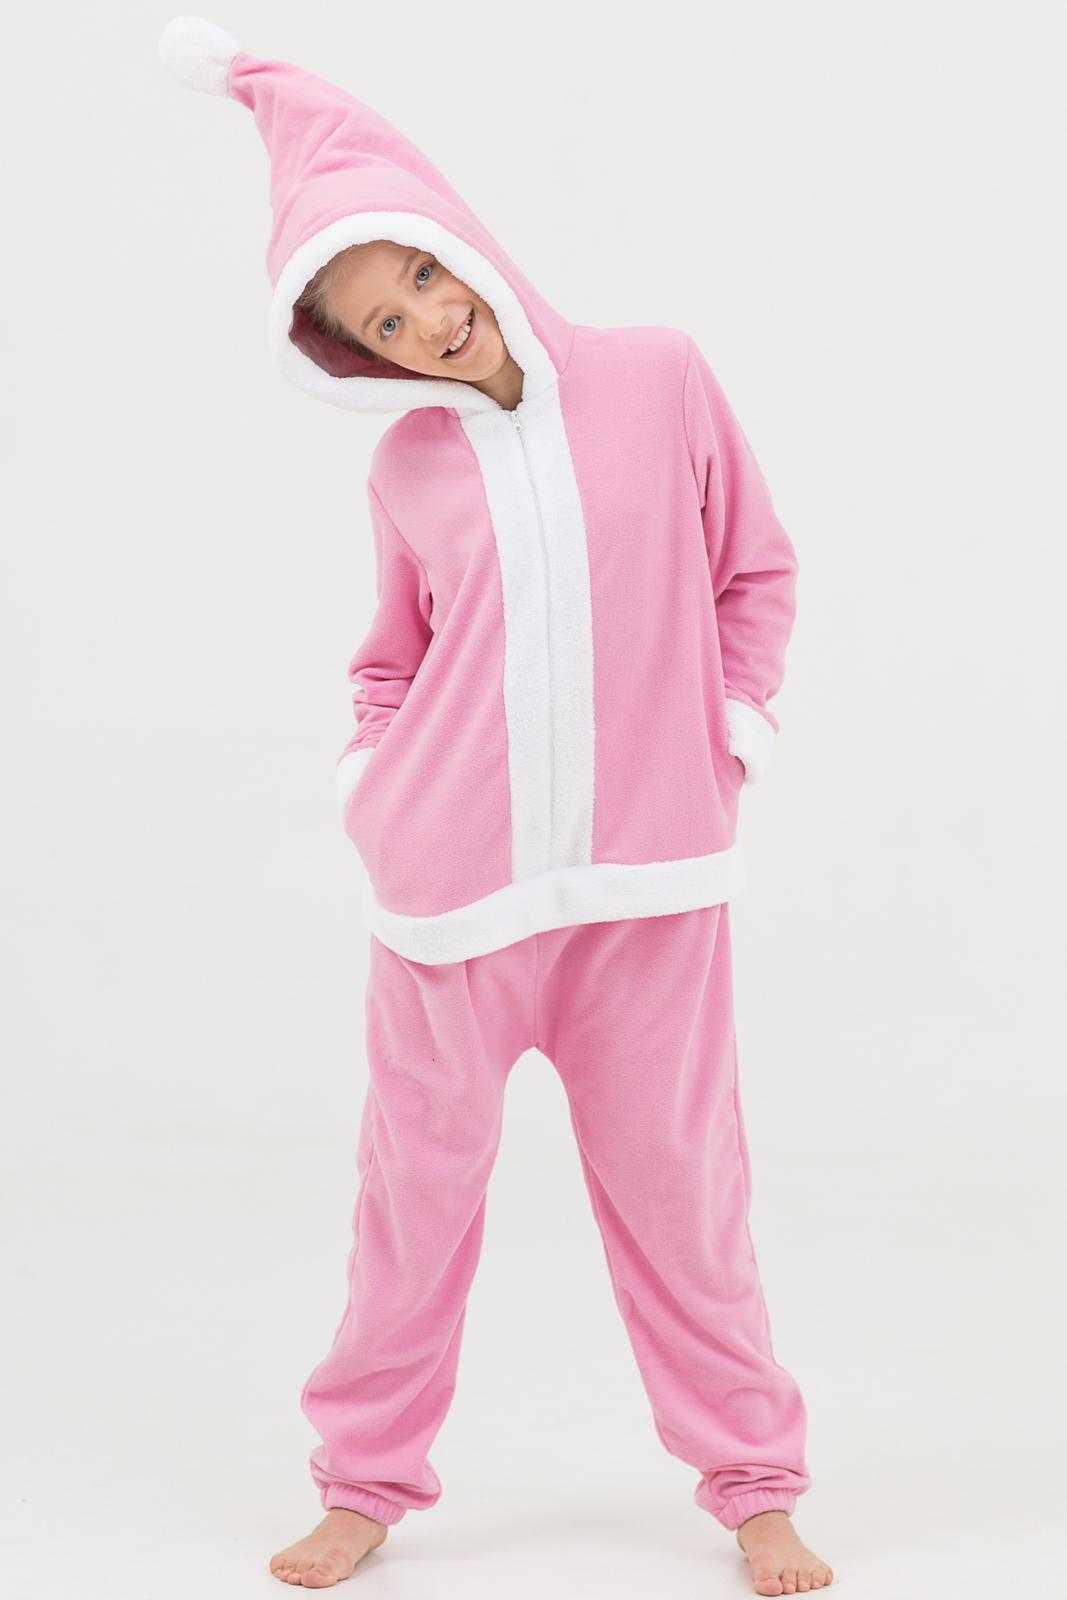 450781e8e6ef Детская пижама-кигуруми